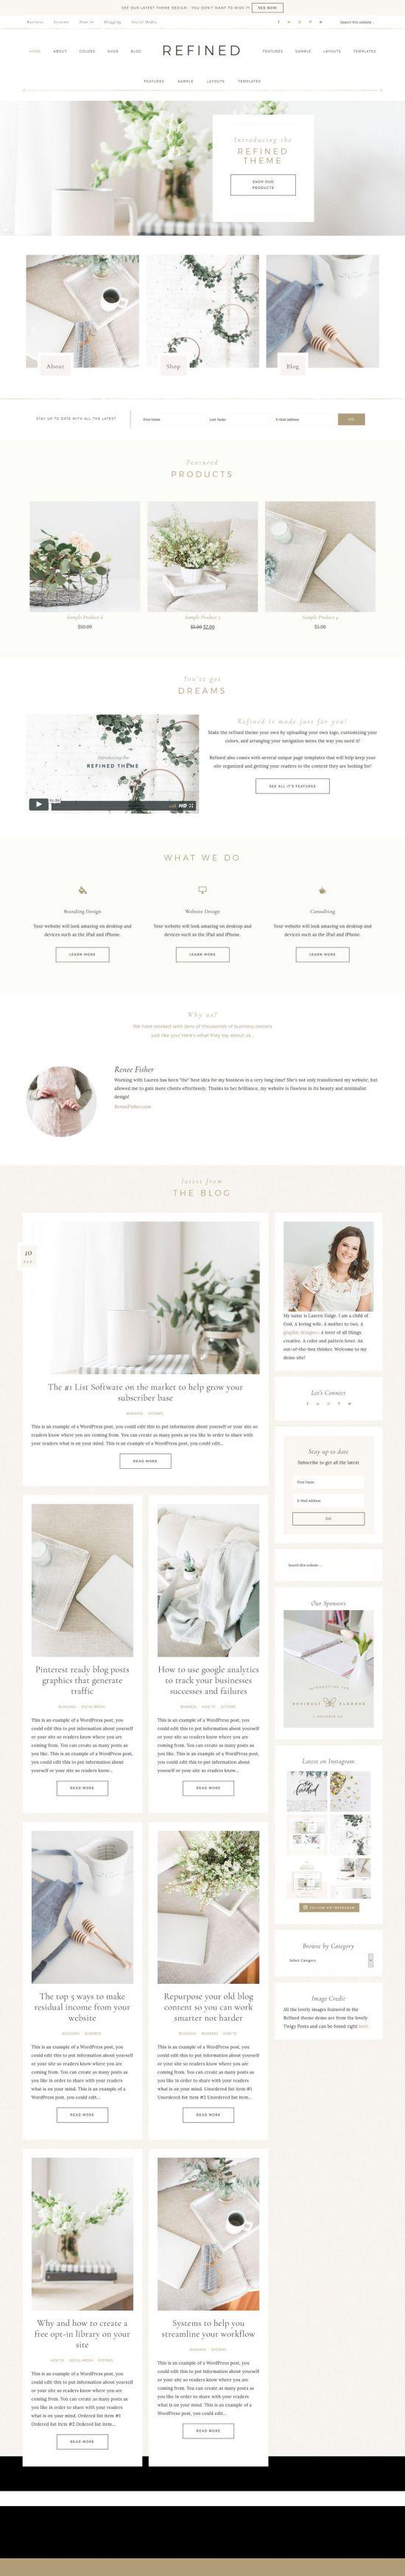 refined restored designs wordpress theme 01 - Refined Genesis WordPress Theme